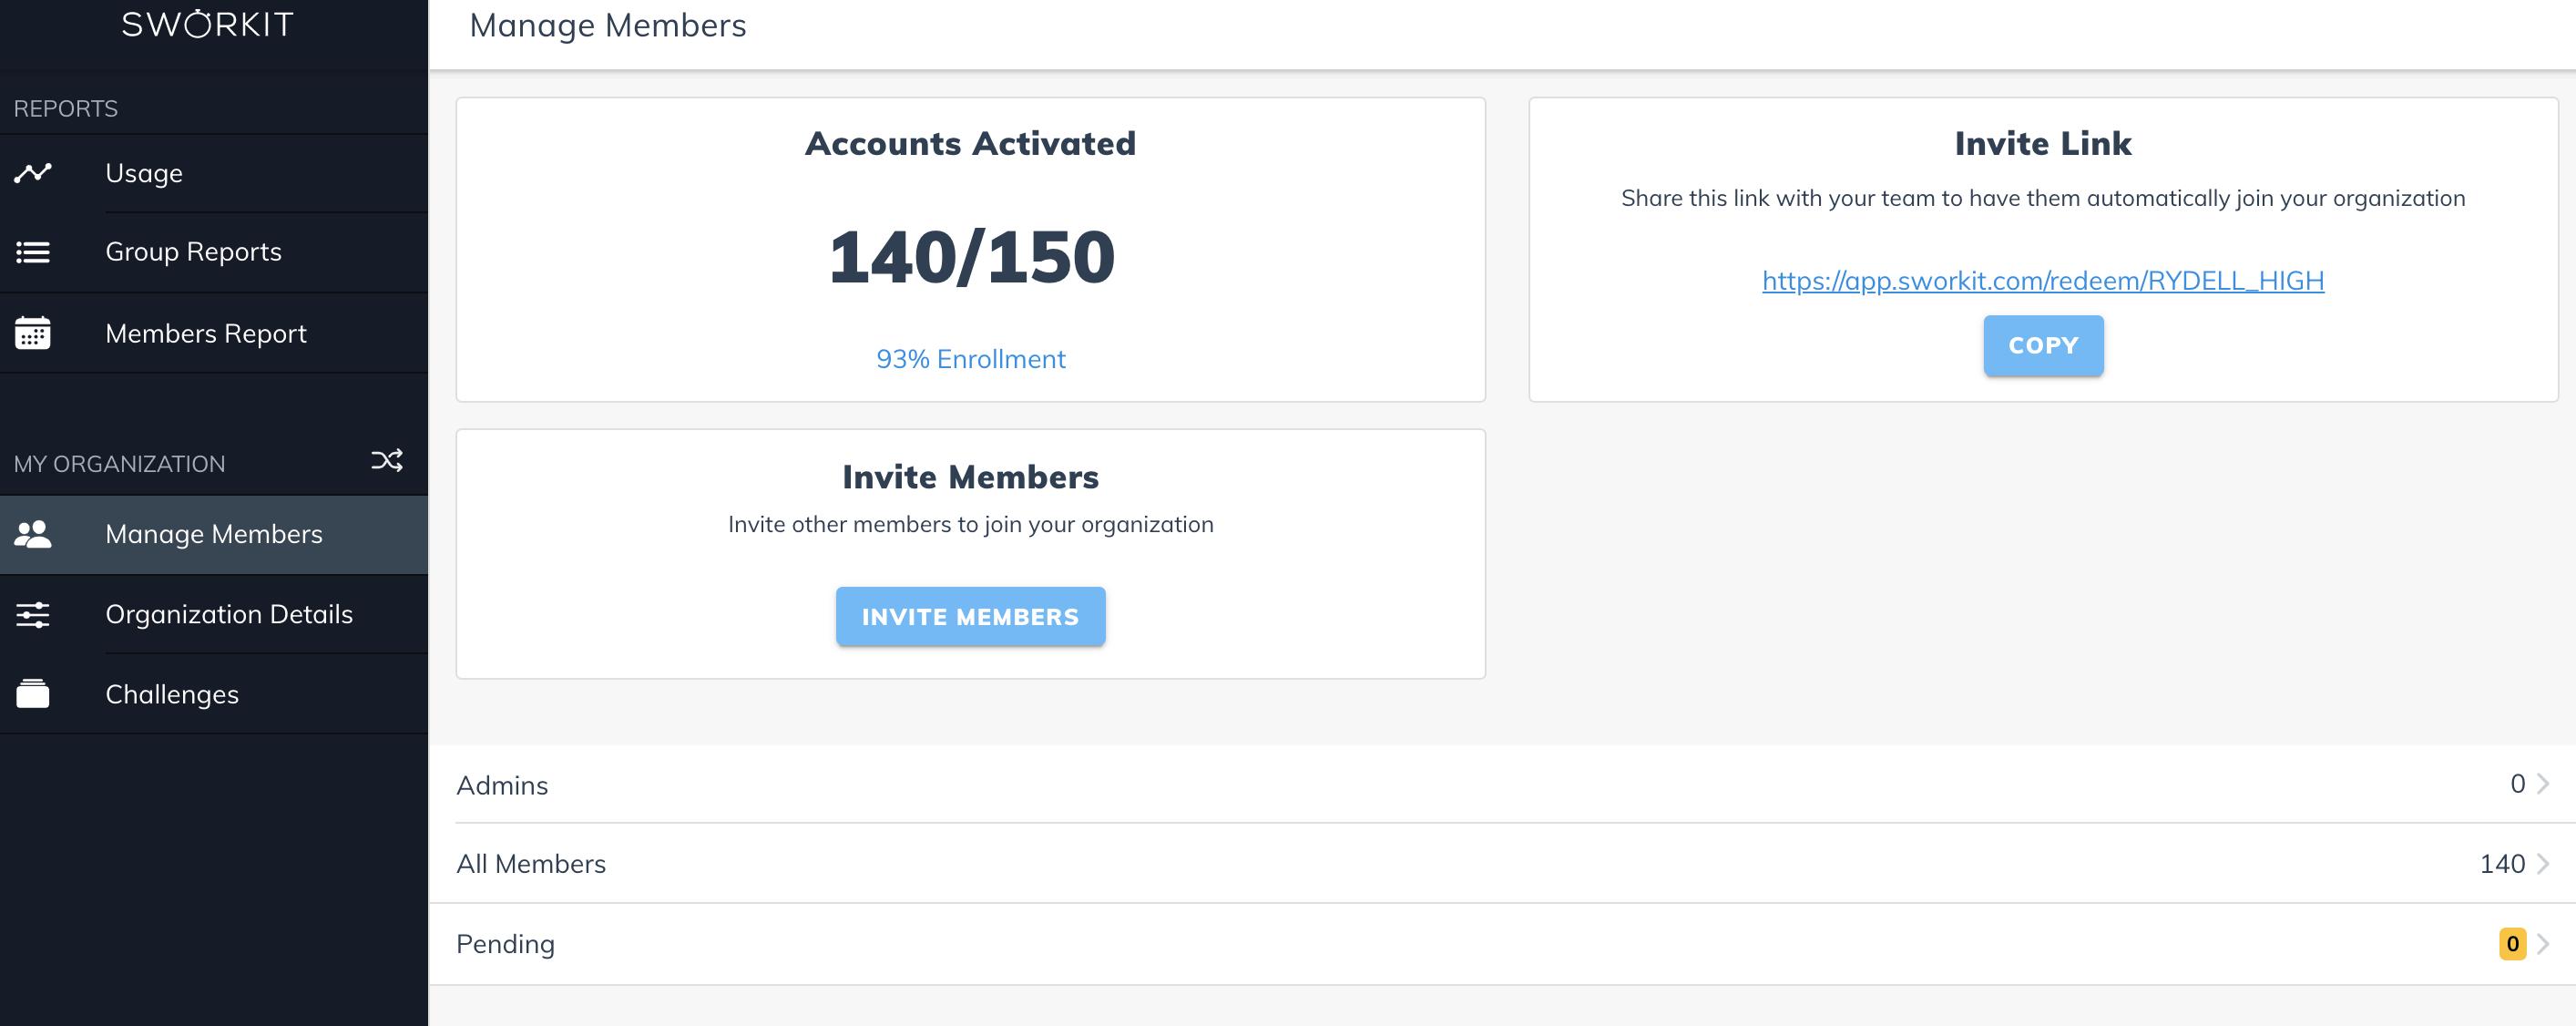 Sworkit Student Engagement Portal - Invite Link